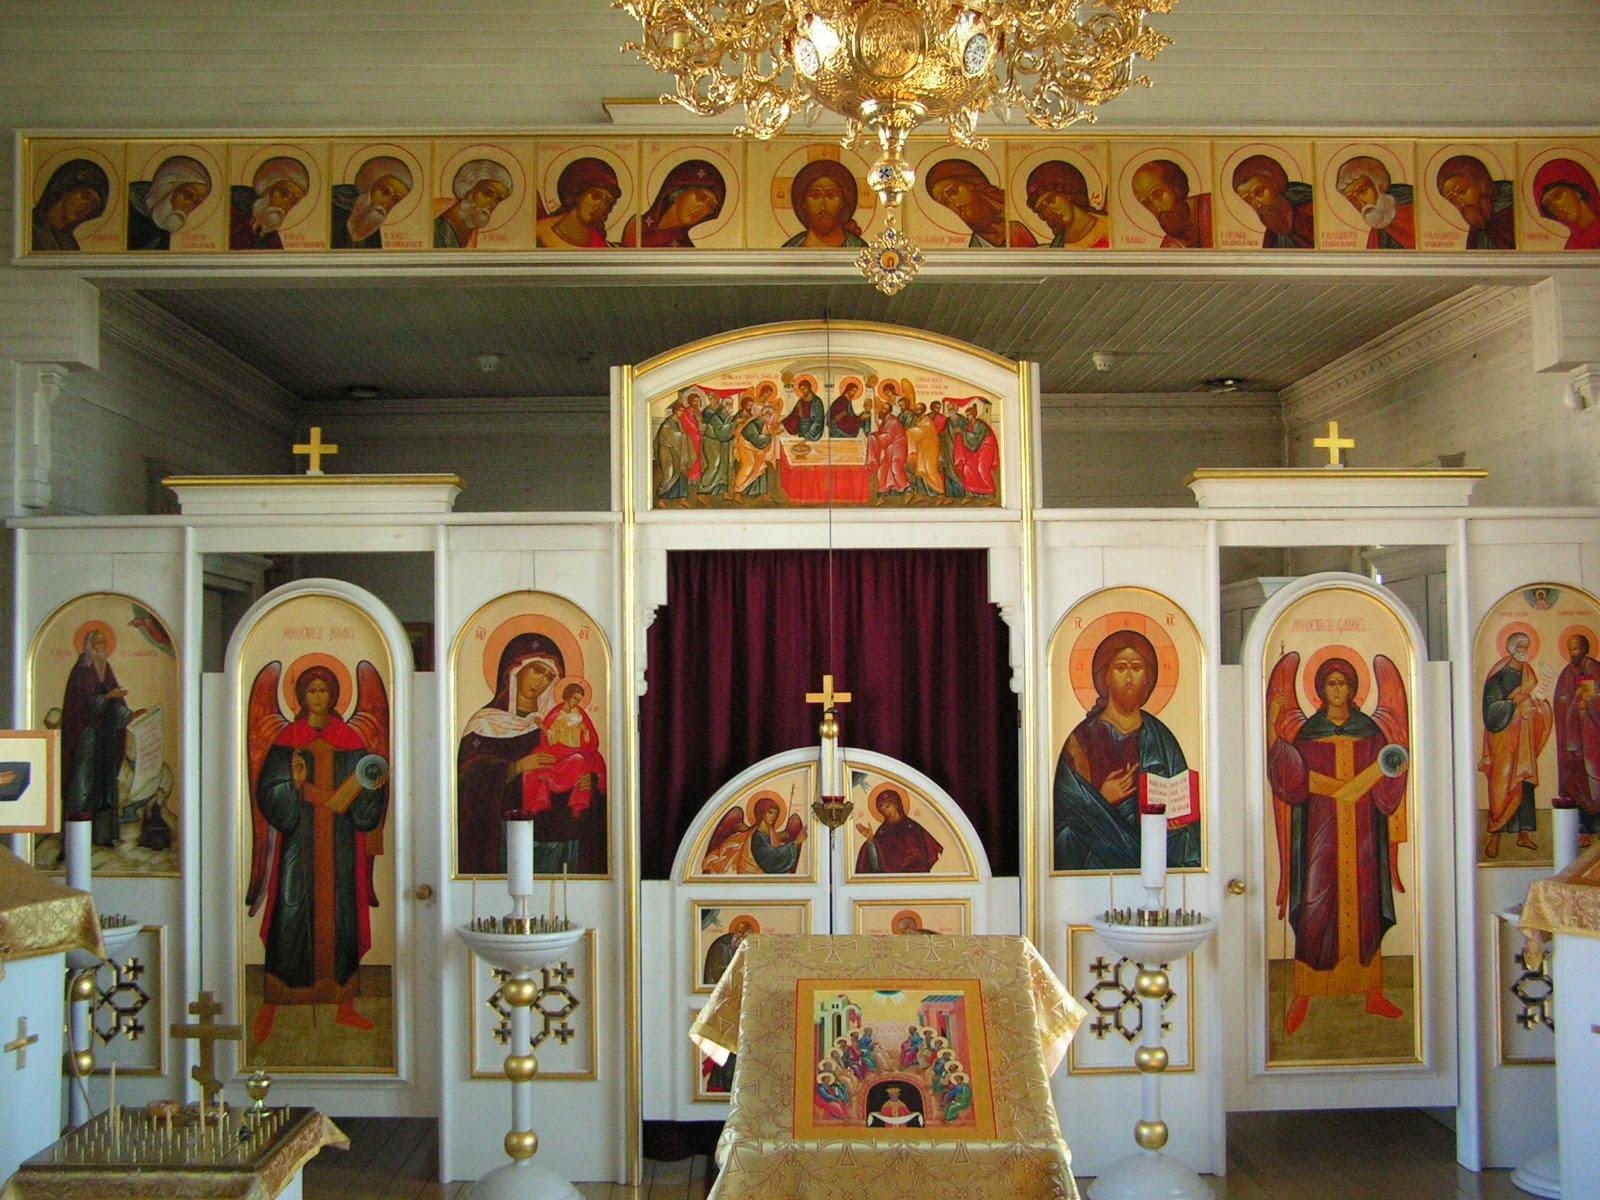 katolska kyrkan helsingborg